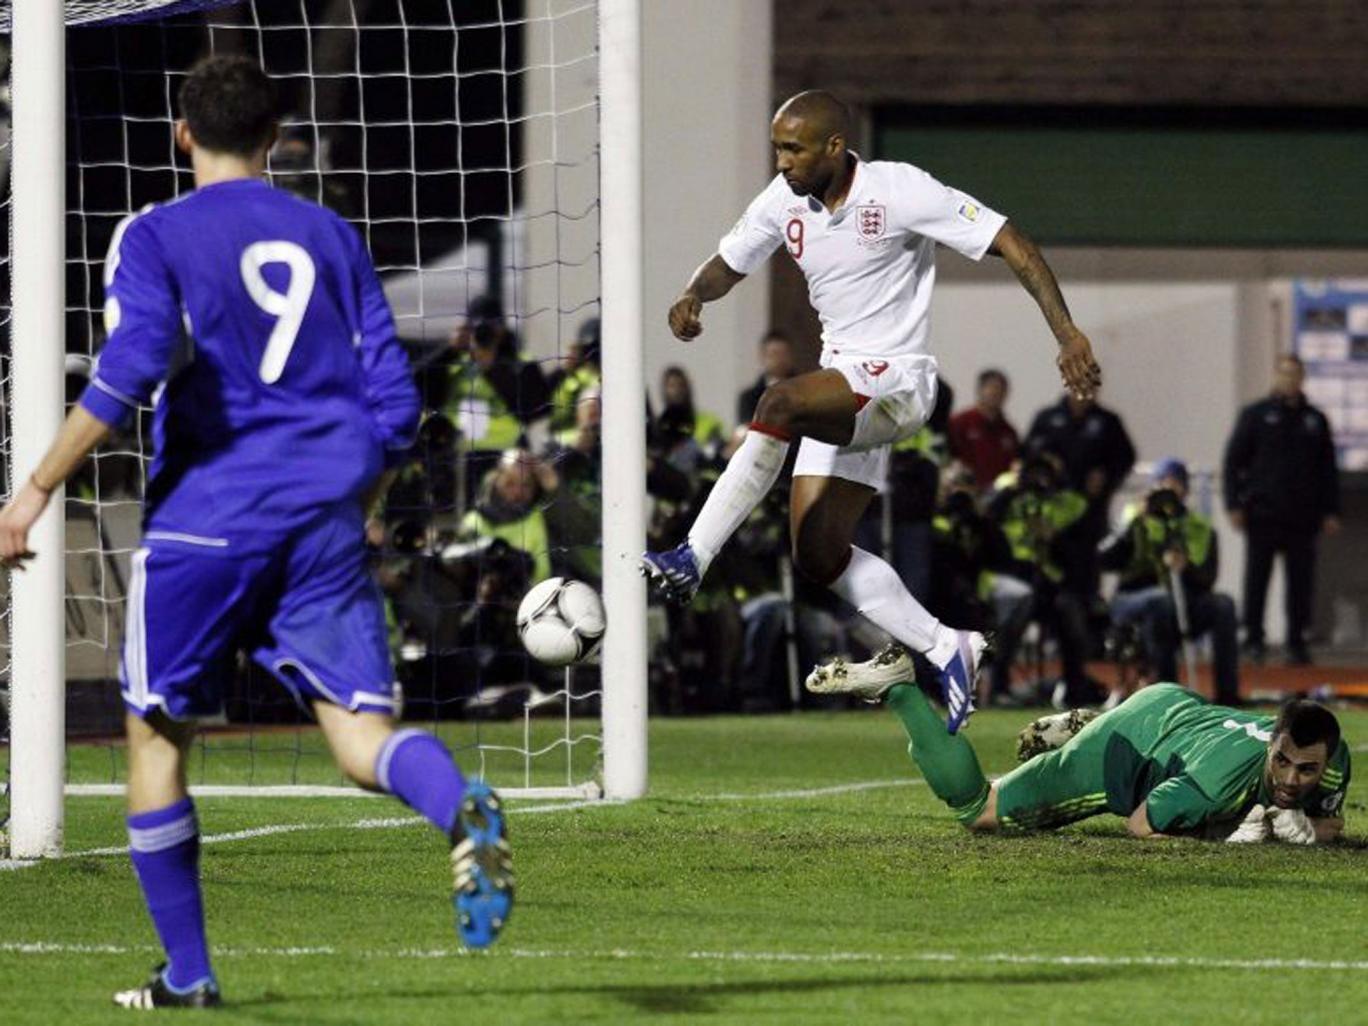 Jermain Defoe taps in his goal for England